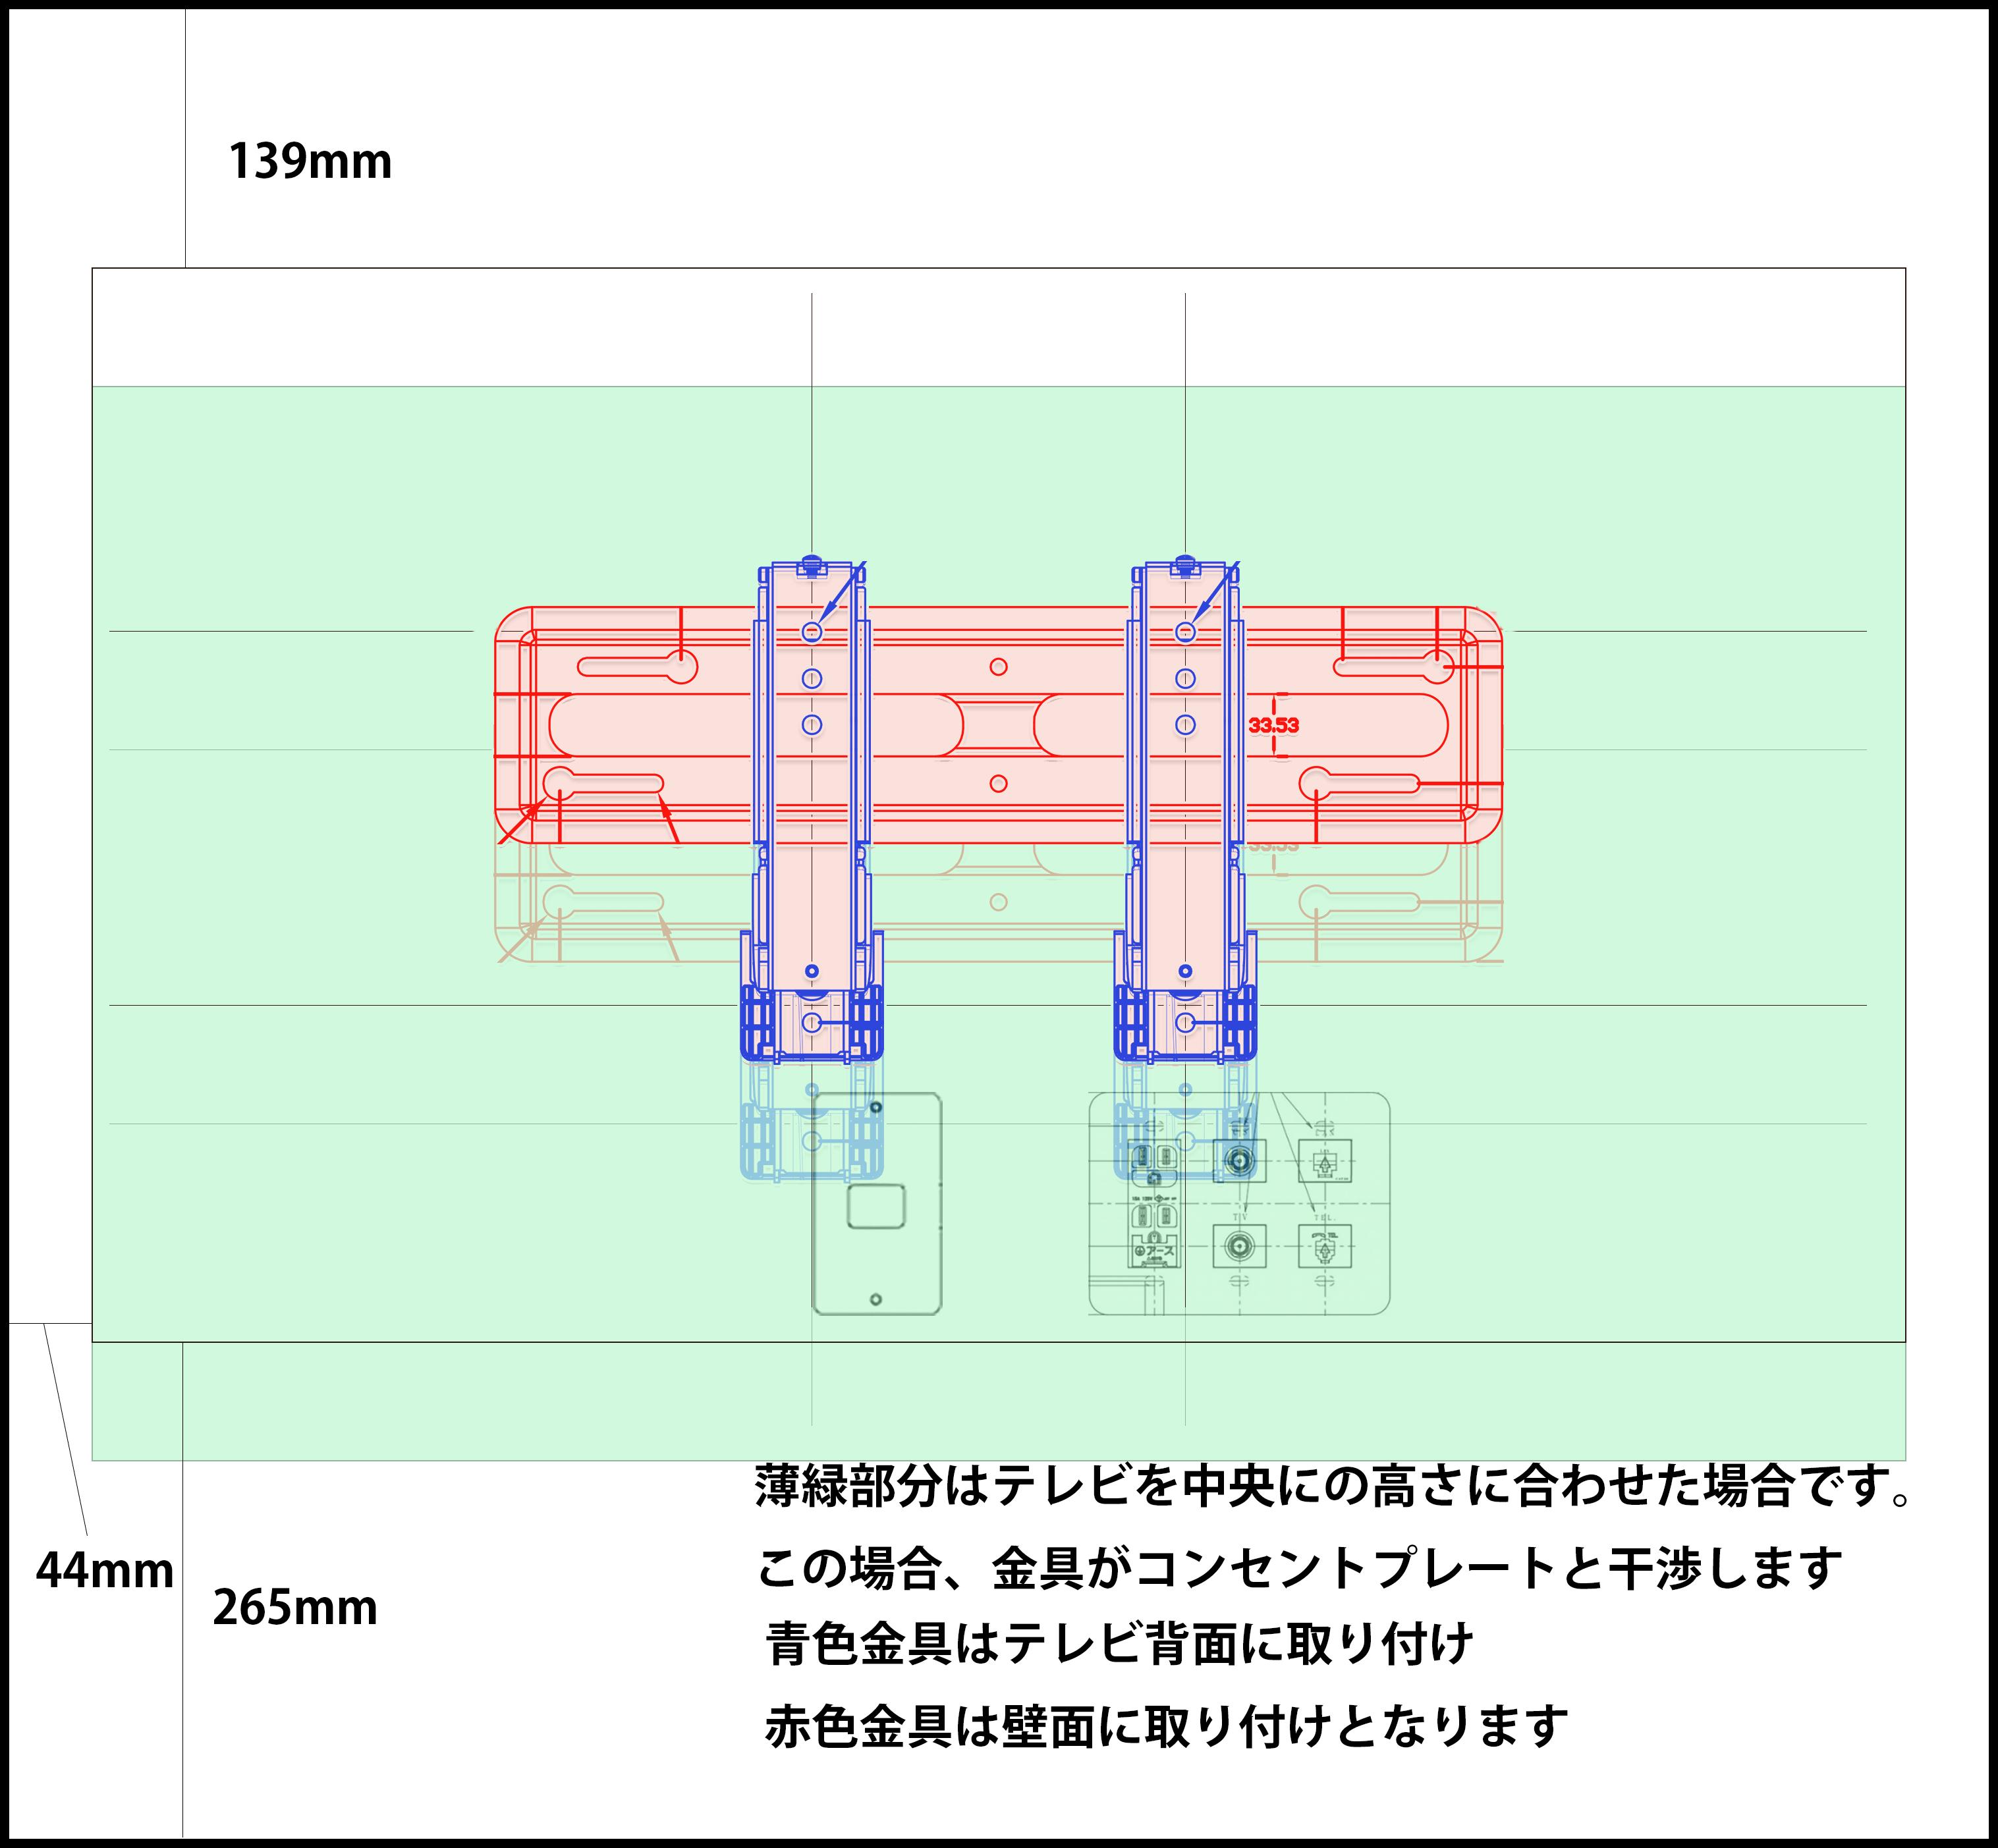 REGZA 40J10を当社推奨金具VML5で取り付けた時の金具と既存コンセントプレートの干渉を考慮した設置イメージ